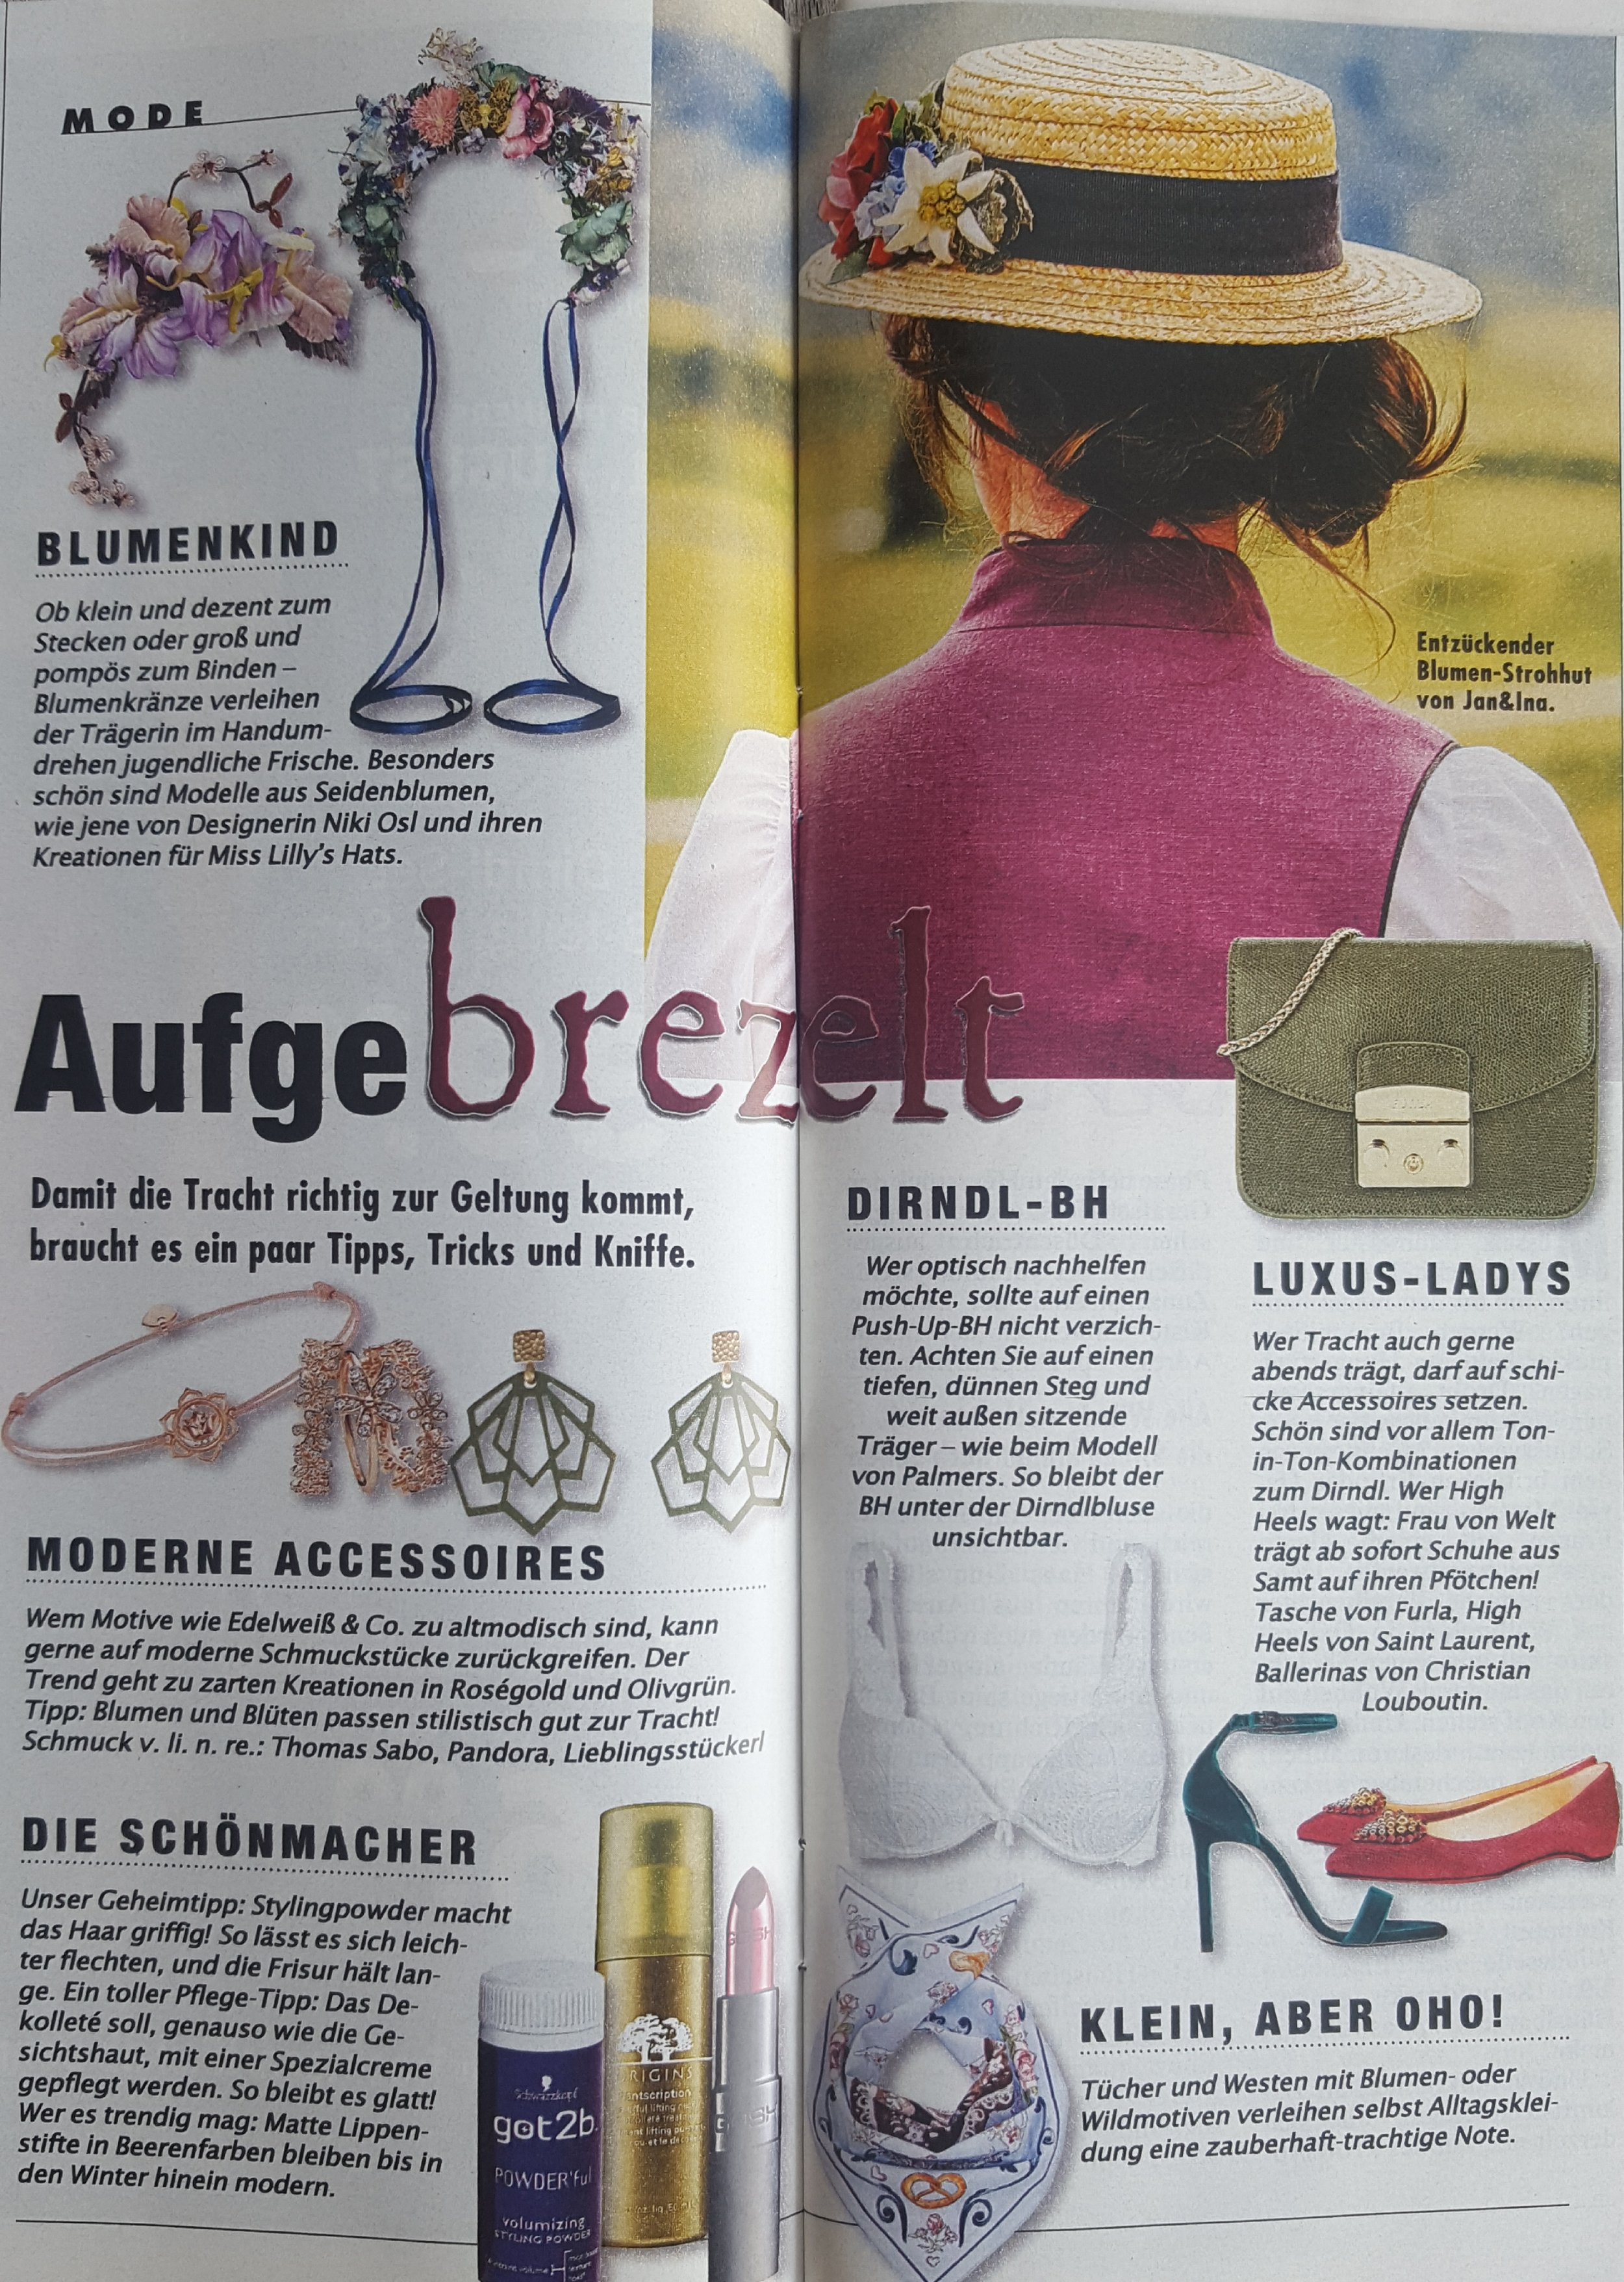 Krone 2017 edition lieblingsstueckerl 1.jpg